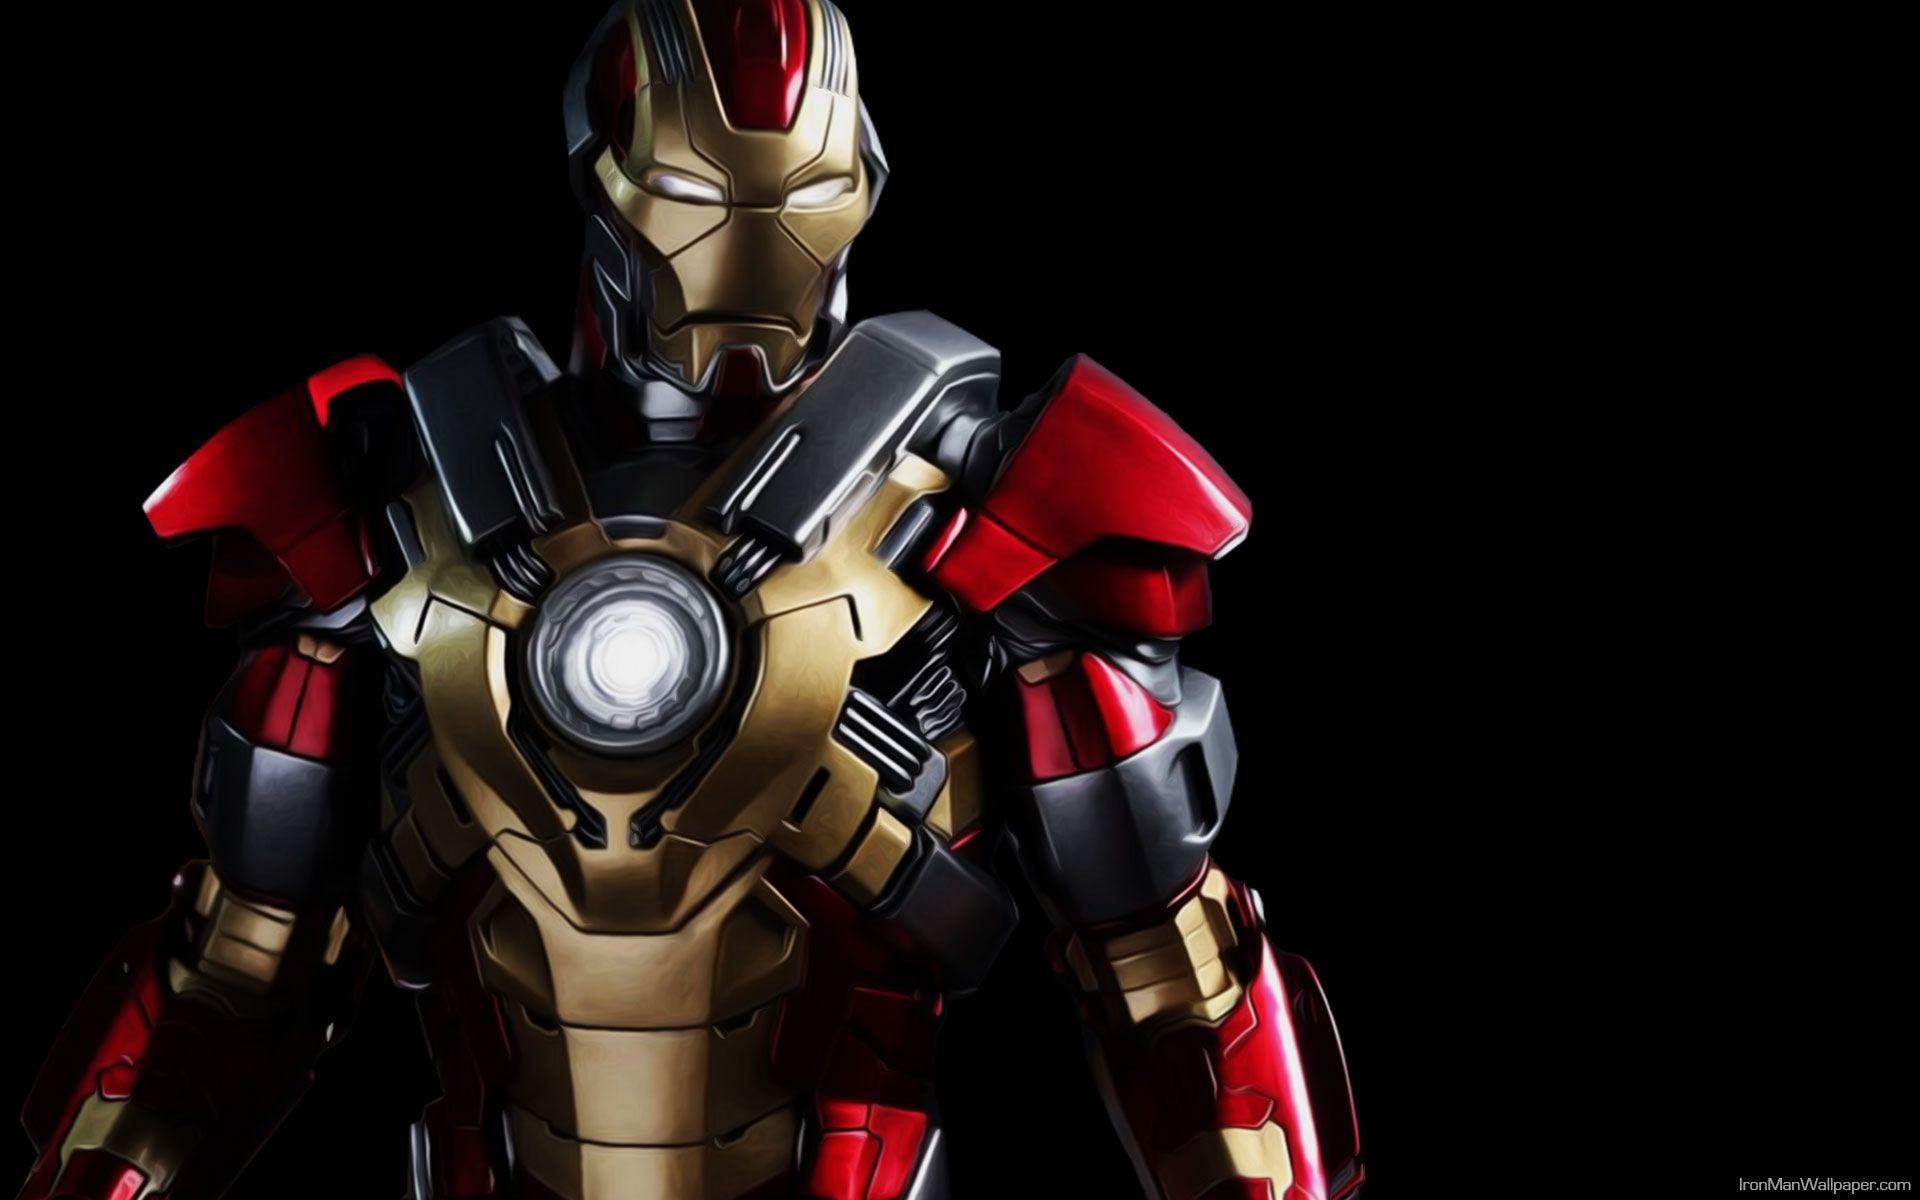 Iron Man Armor 1080p Hd Wallpapers Wallpaper Cave